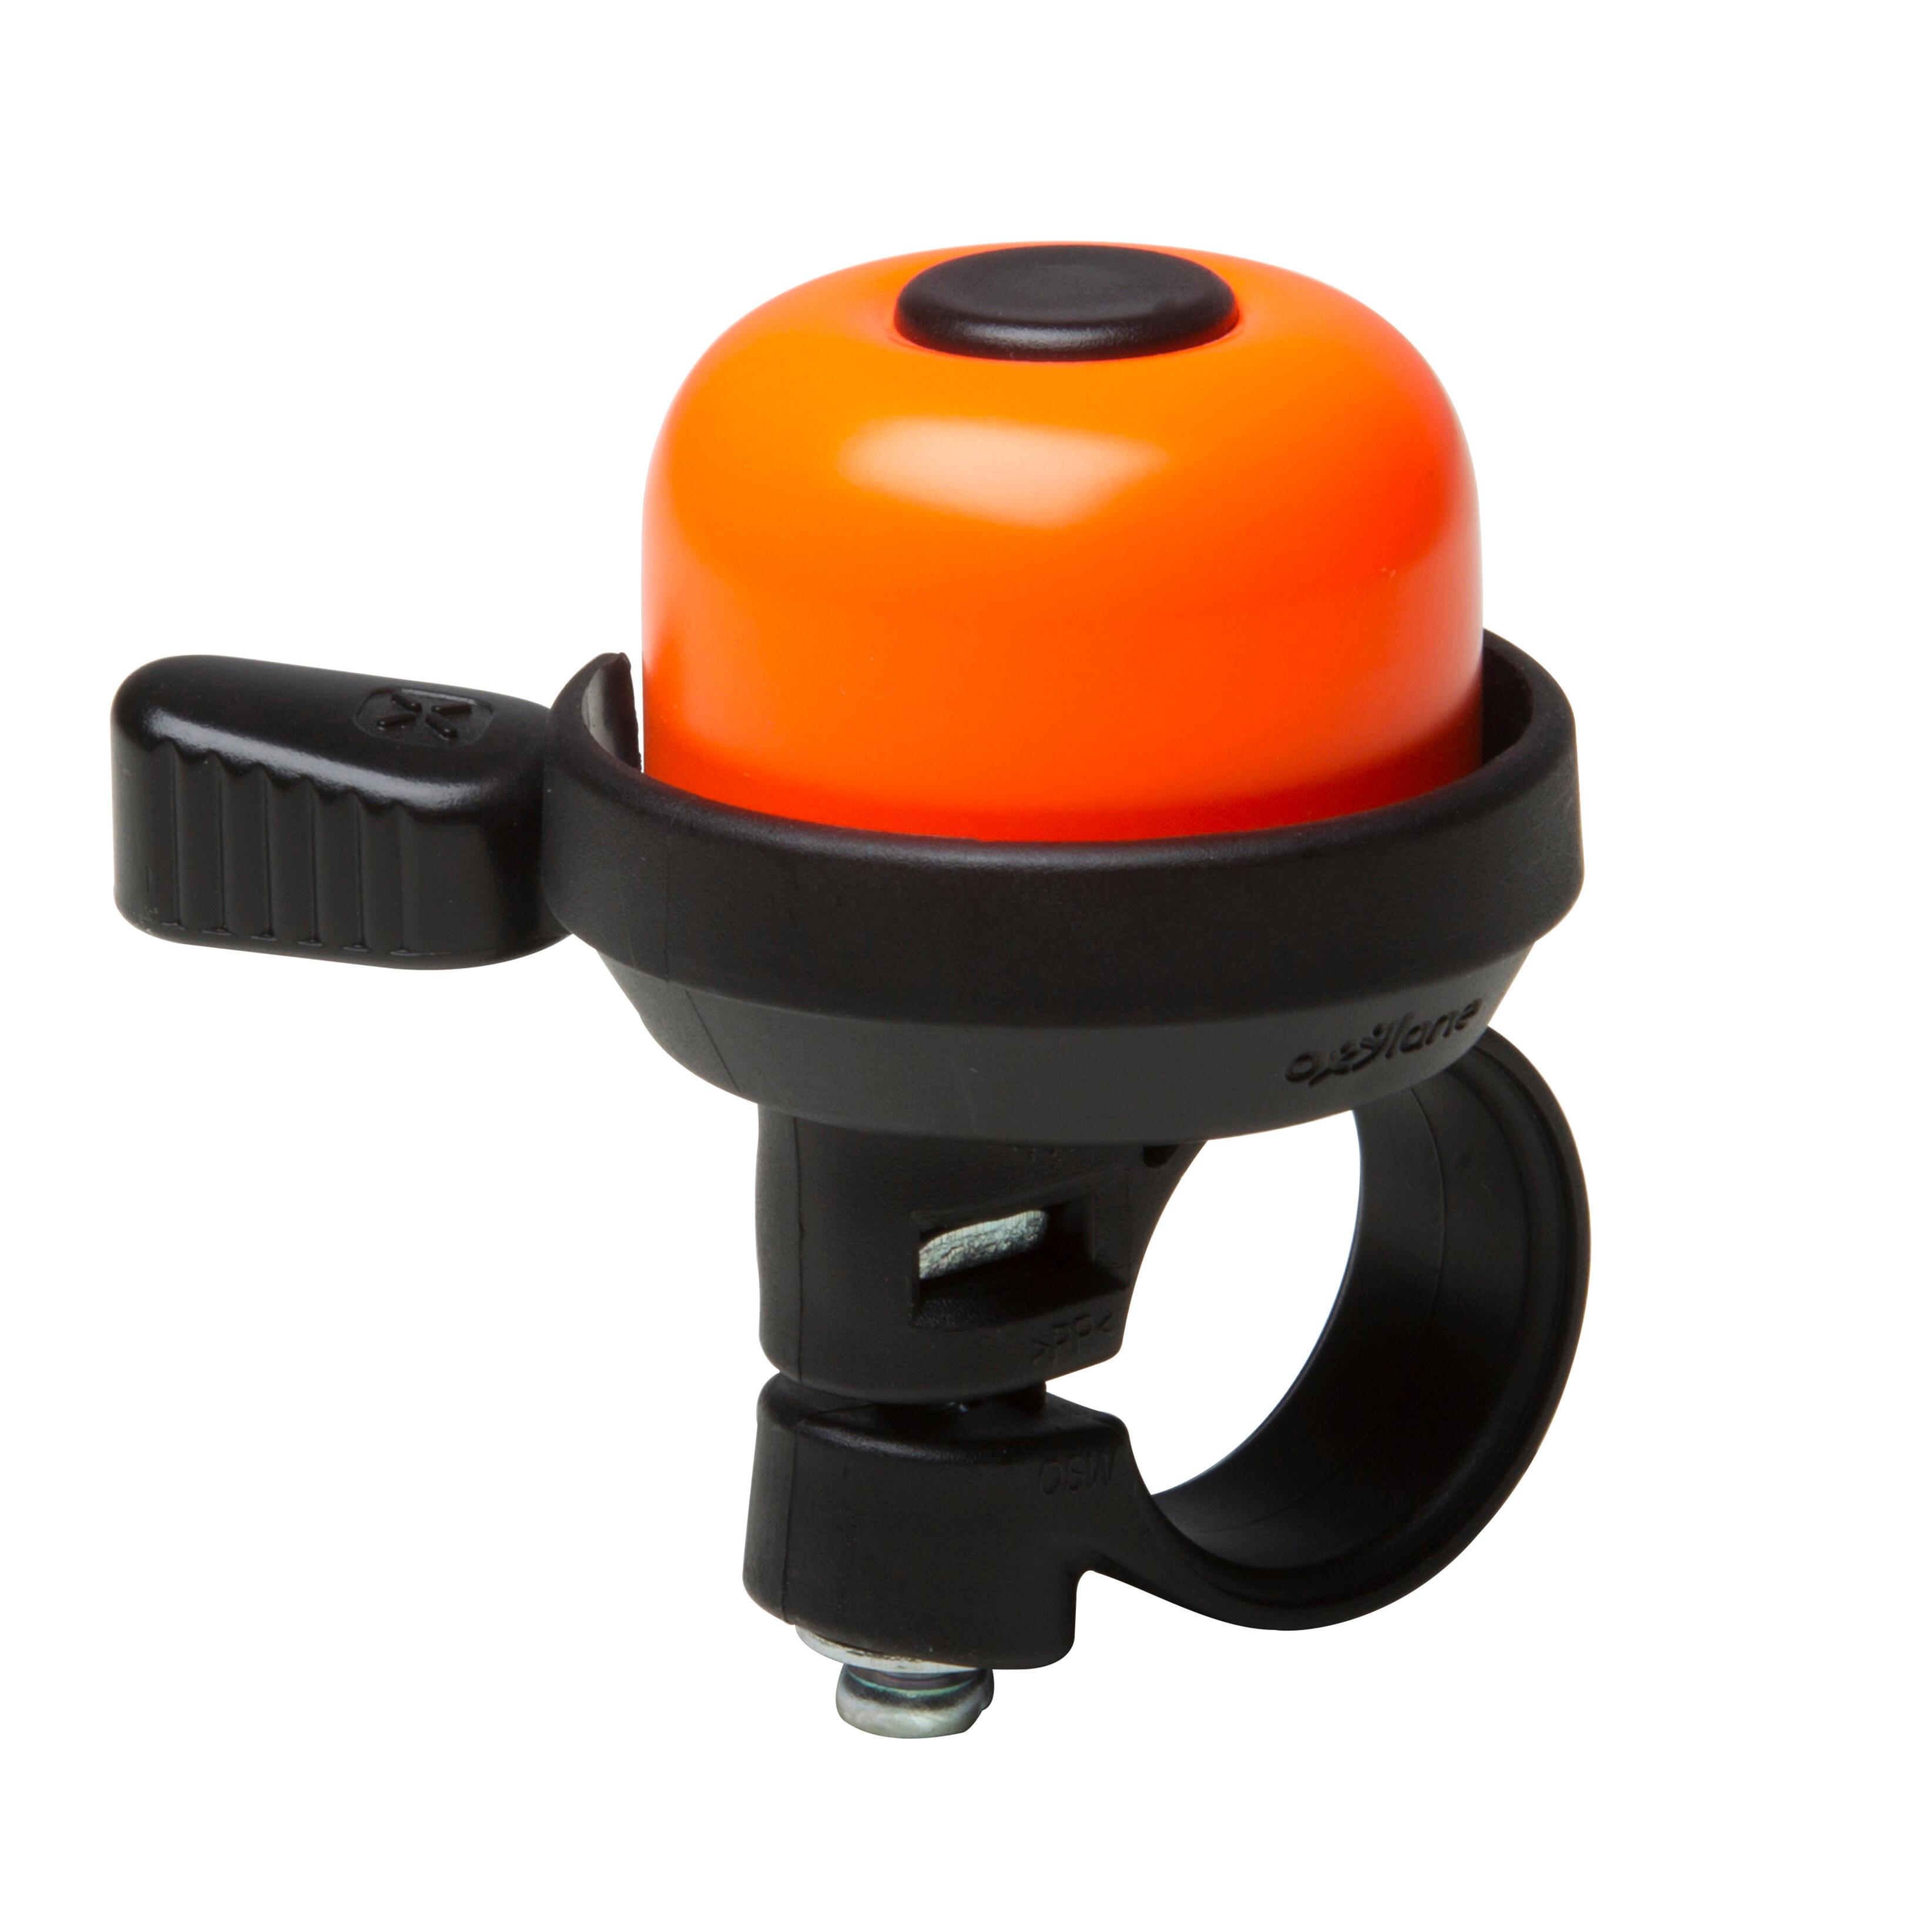 100 Bike Bell - Orange